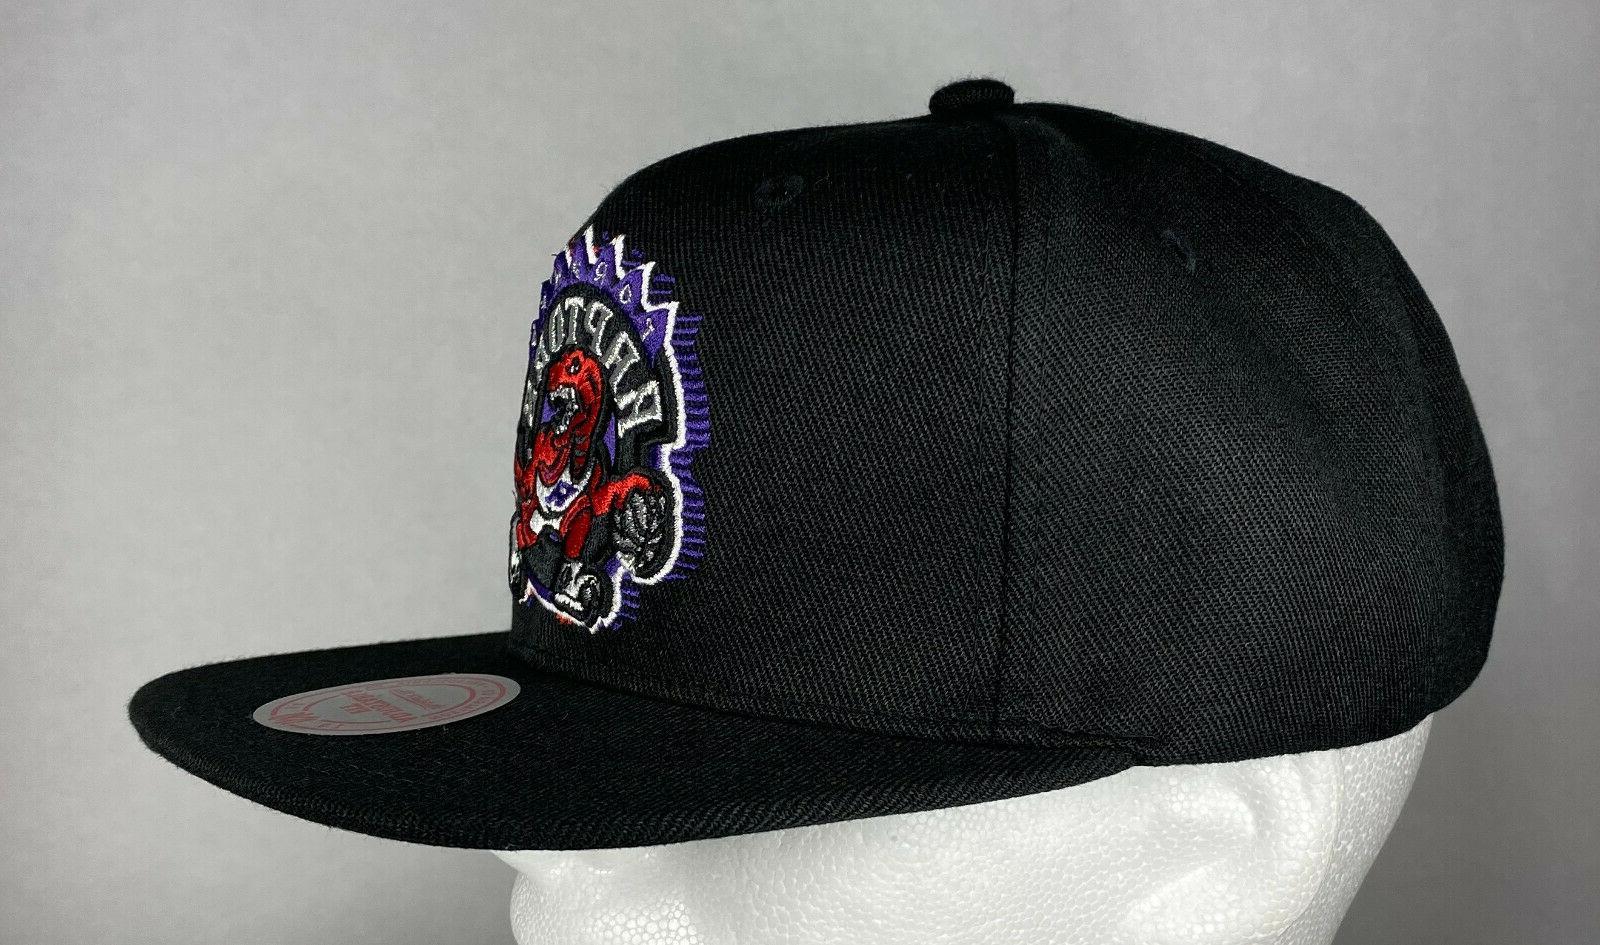 Mitchell and Ness NBA Toronto Raptors HWC Logo Hat, New